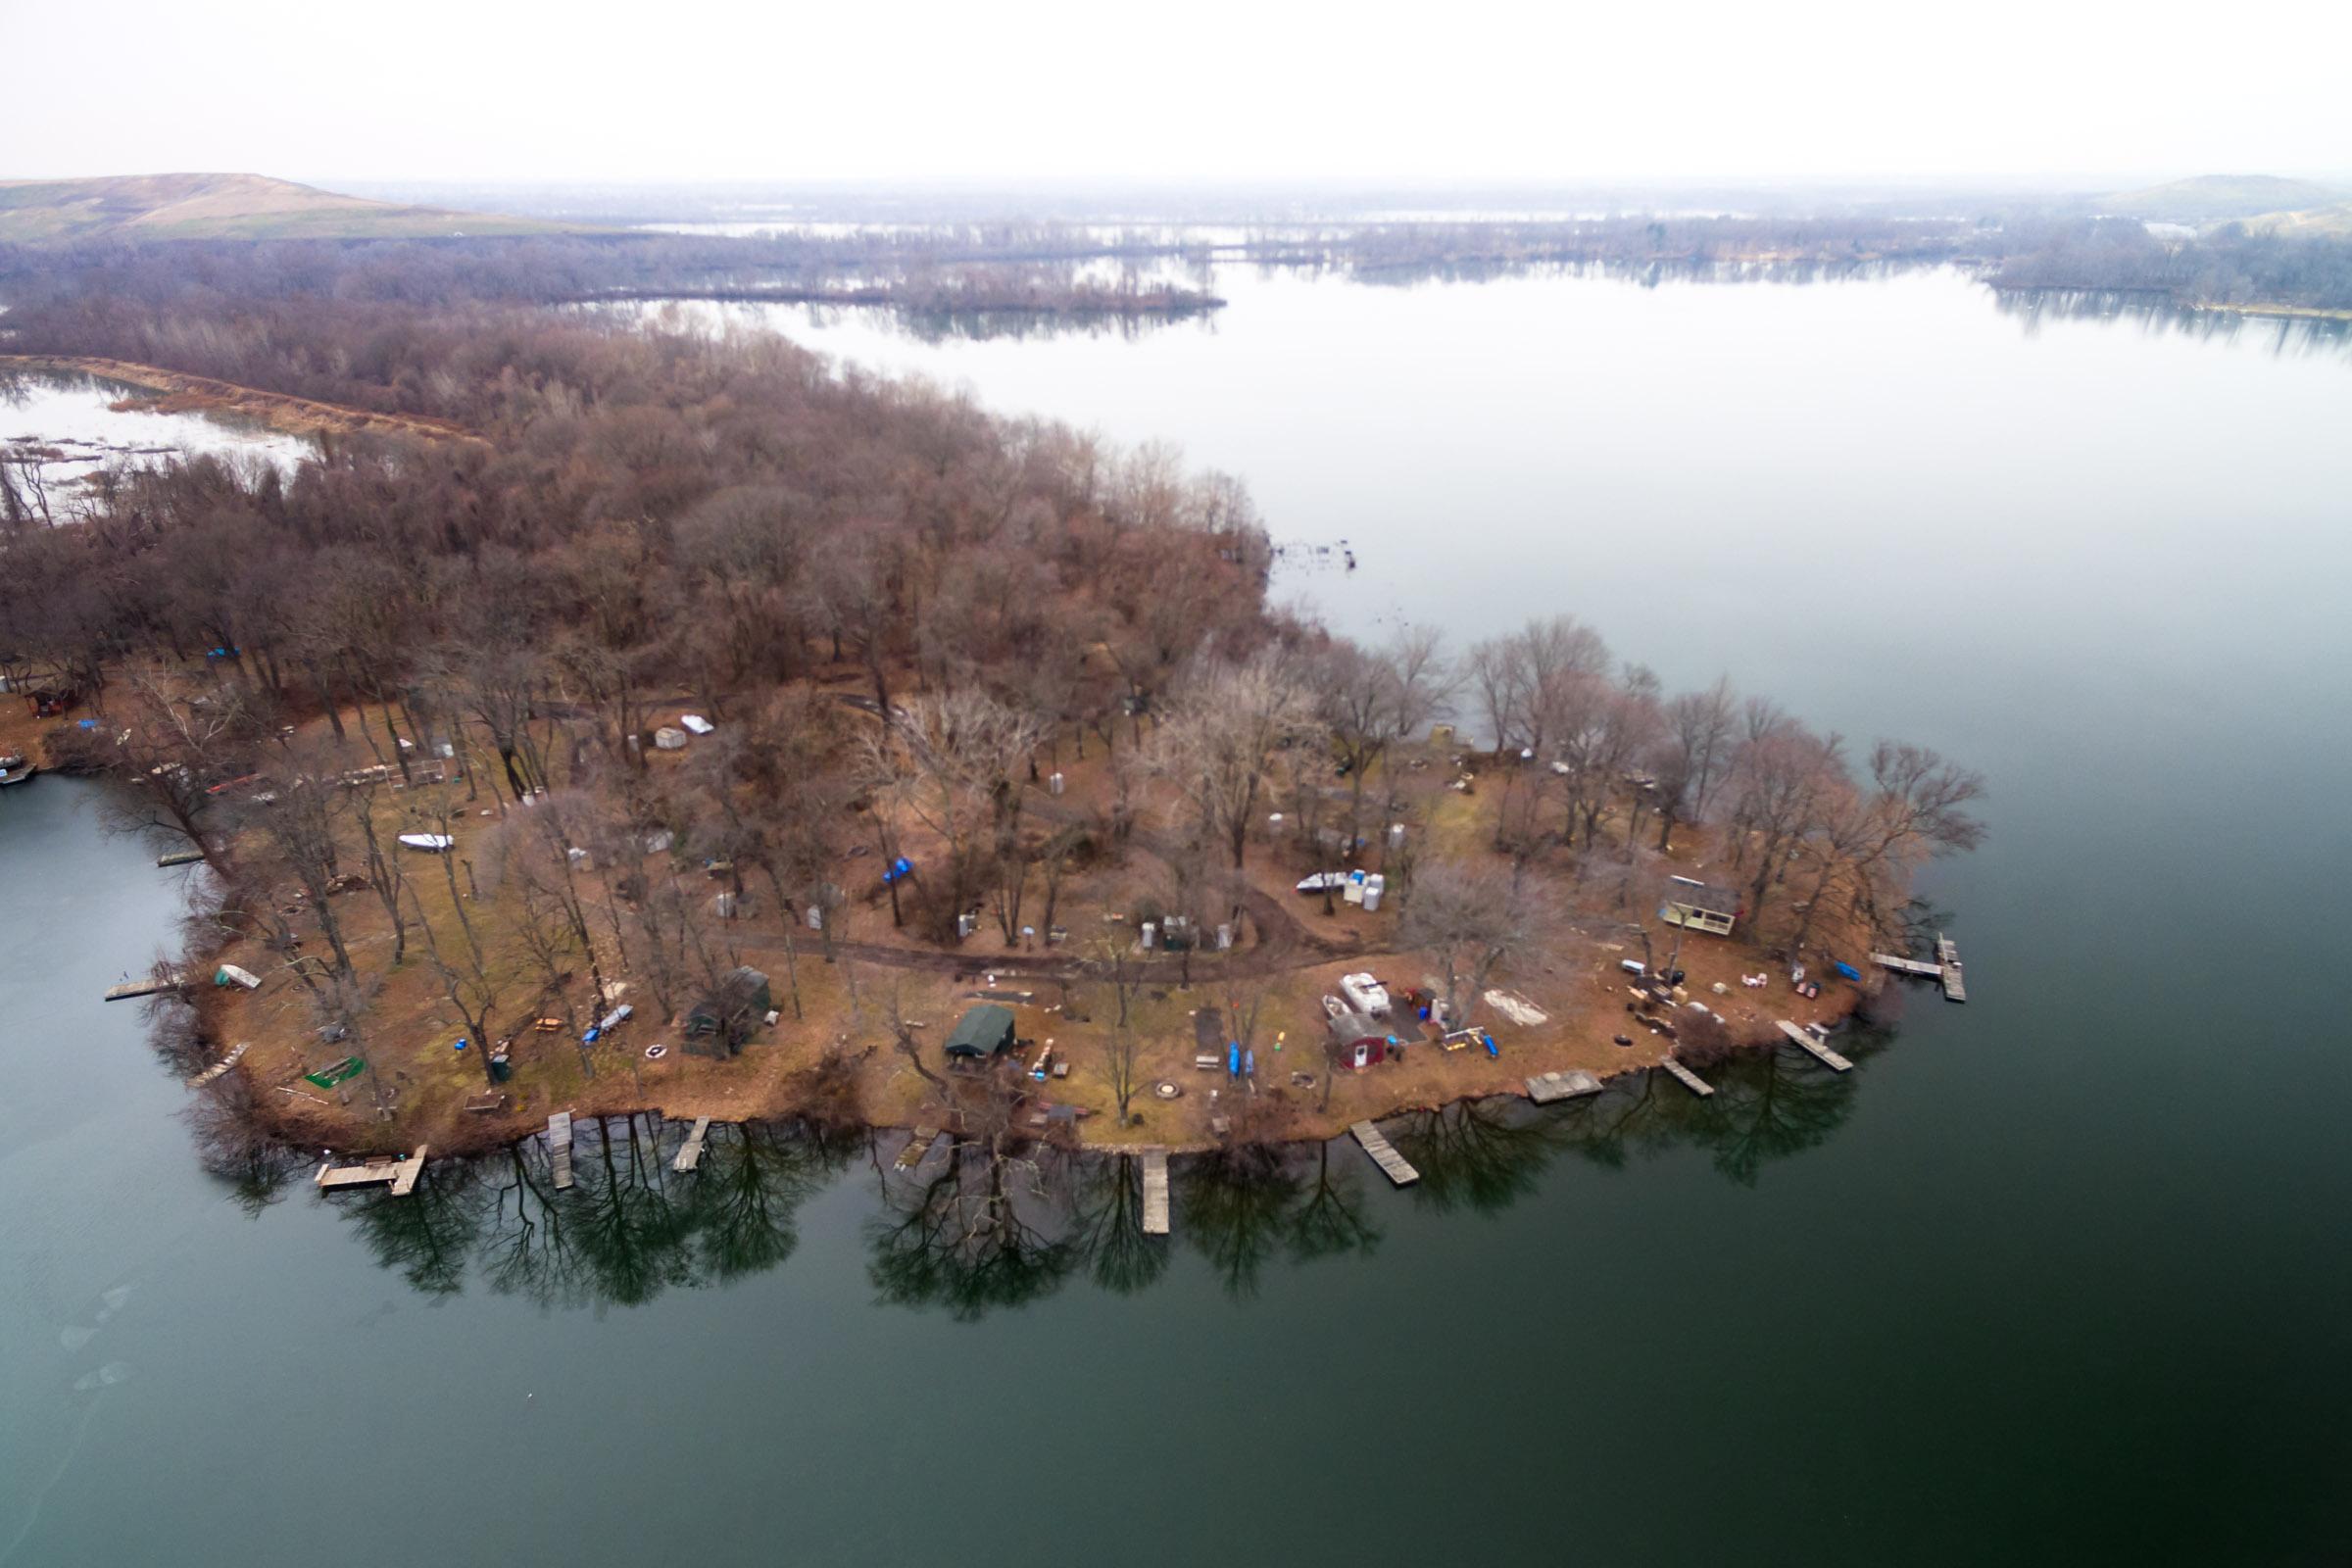 Lake_houses_Ty_Poland_Aerial.jpg